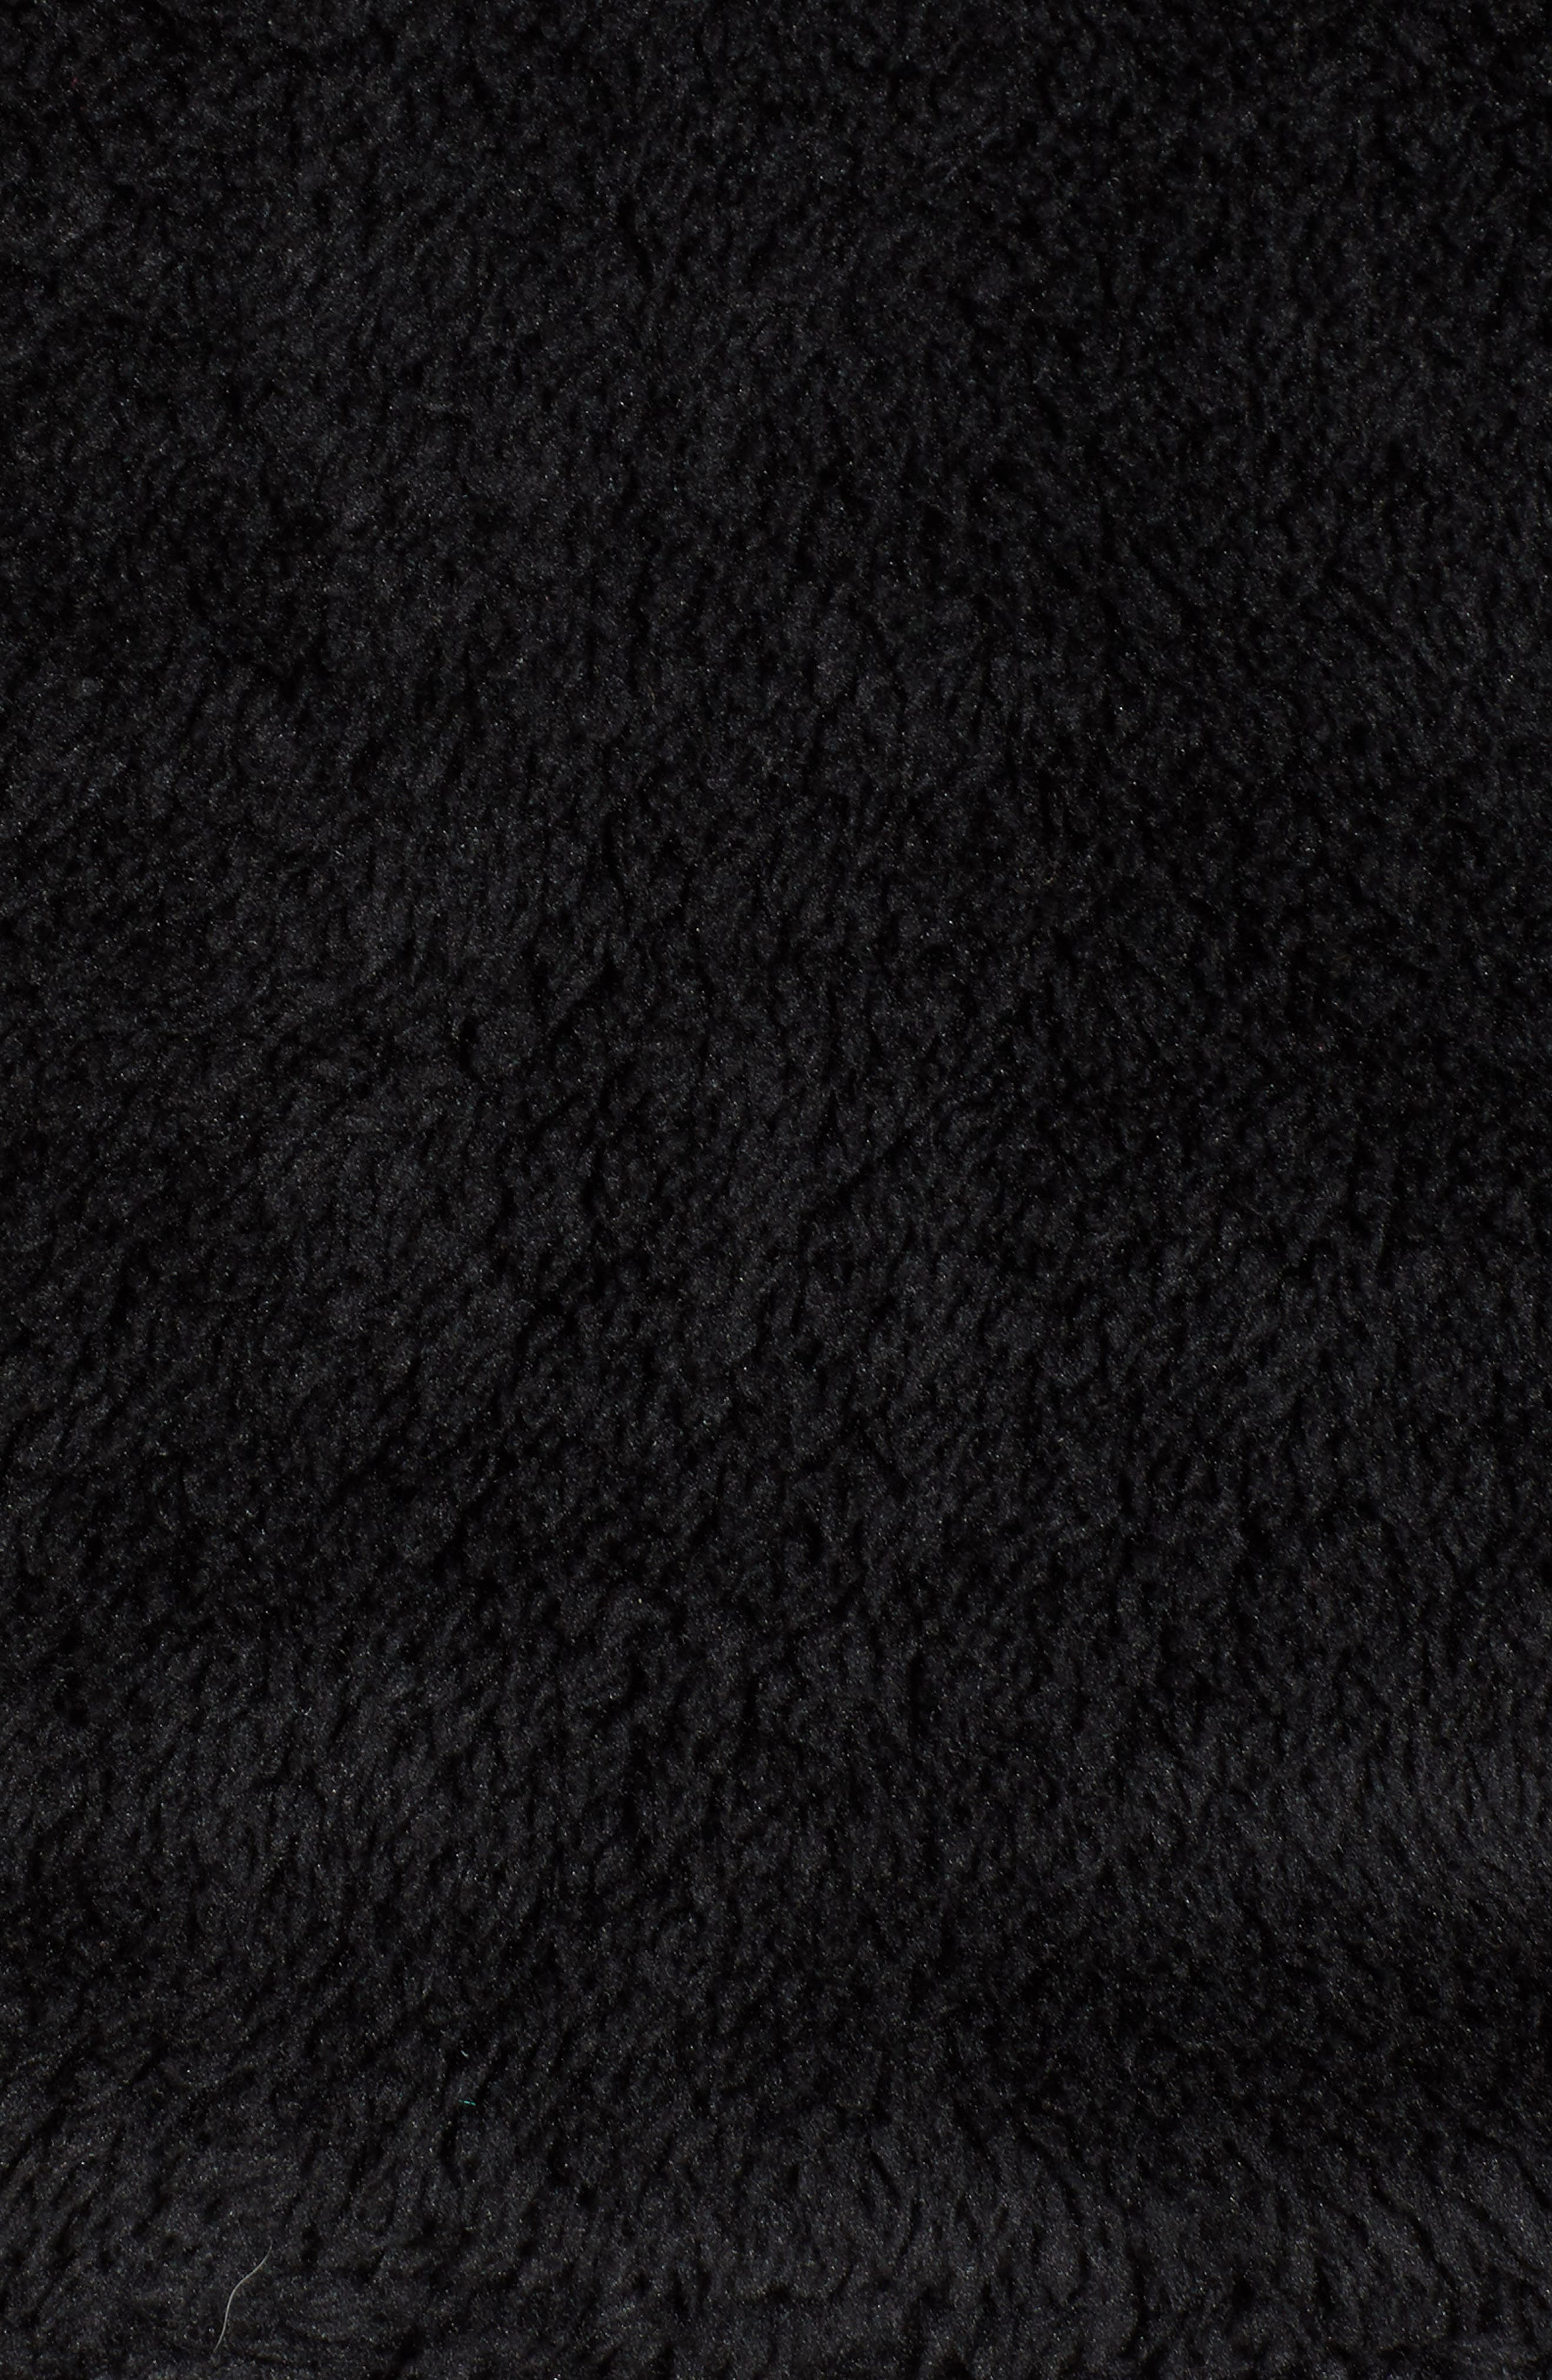 BILLABONG, Cozy For Keeps Fleece Pullover, Alternate thumbnail 6, color, 001